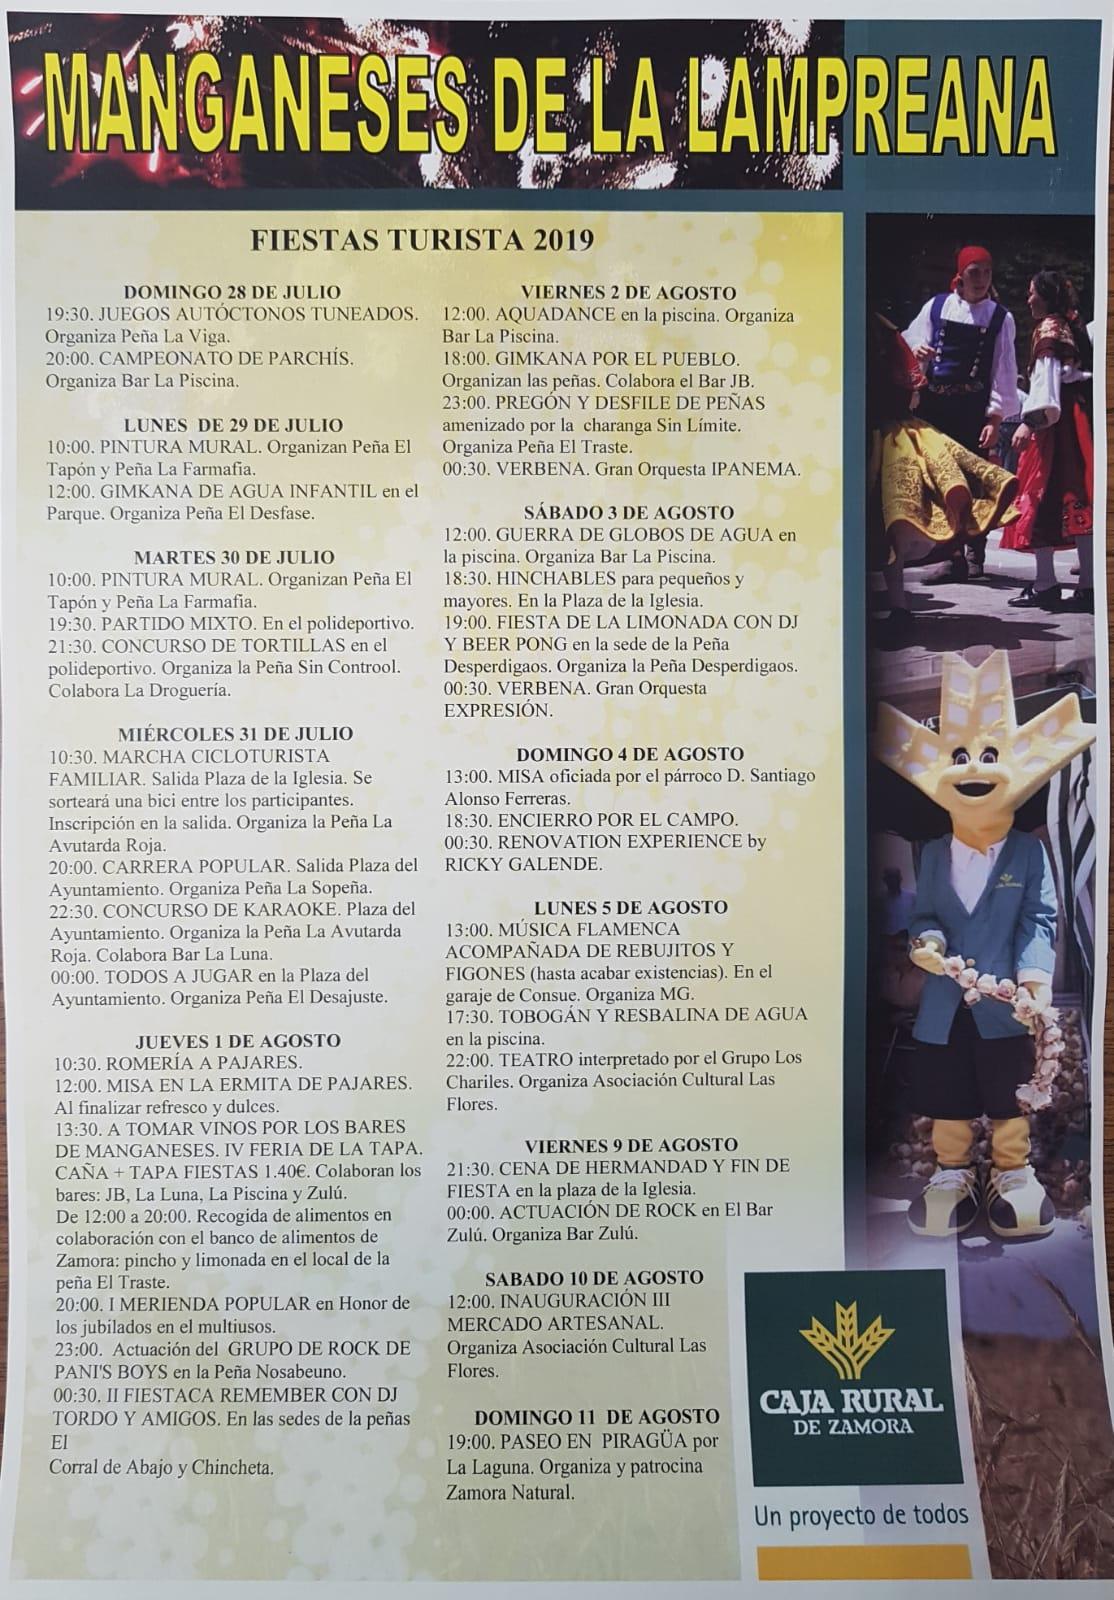 Fiestas del Turista 2019